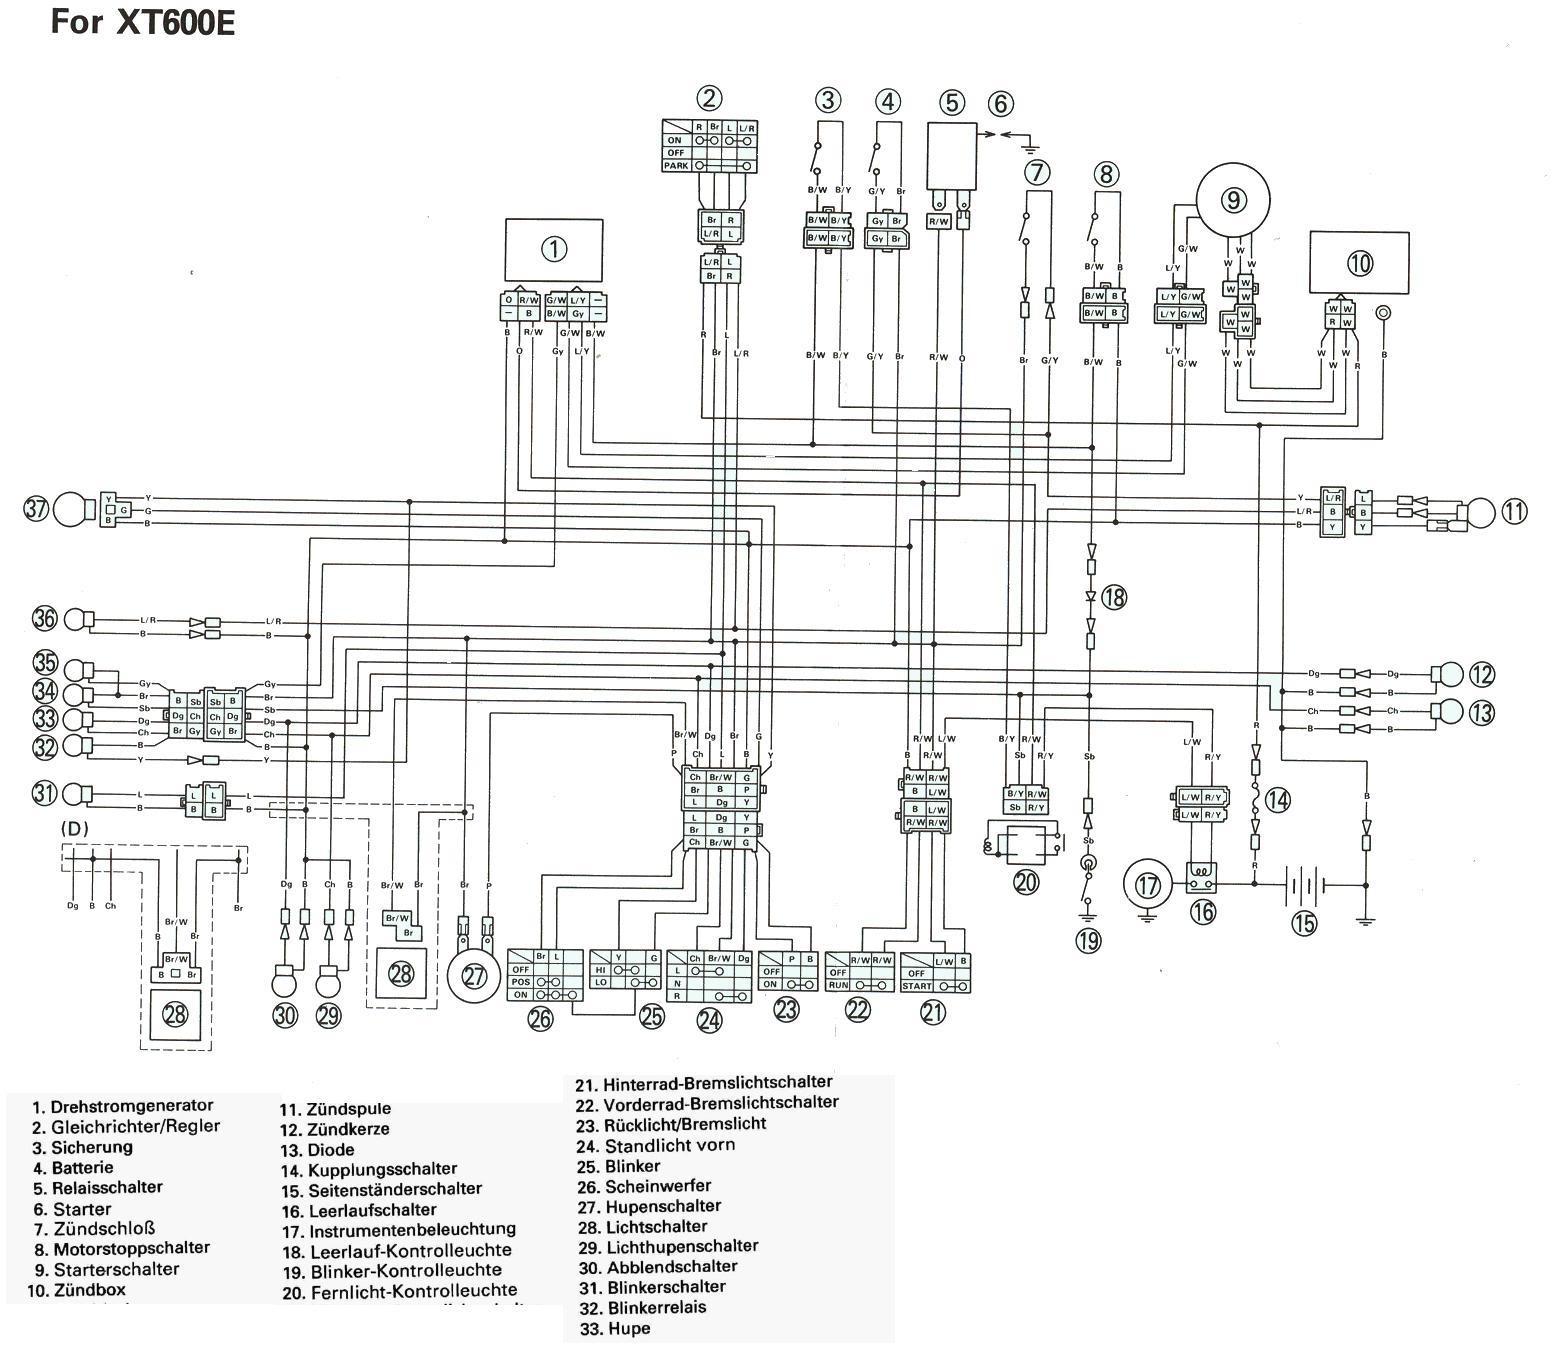 Yamaha Virago 920 Ignition Wiring Diagram